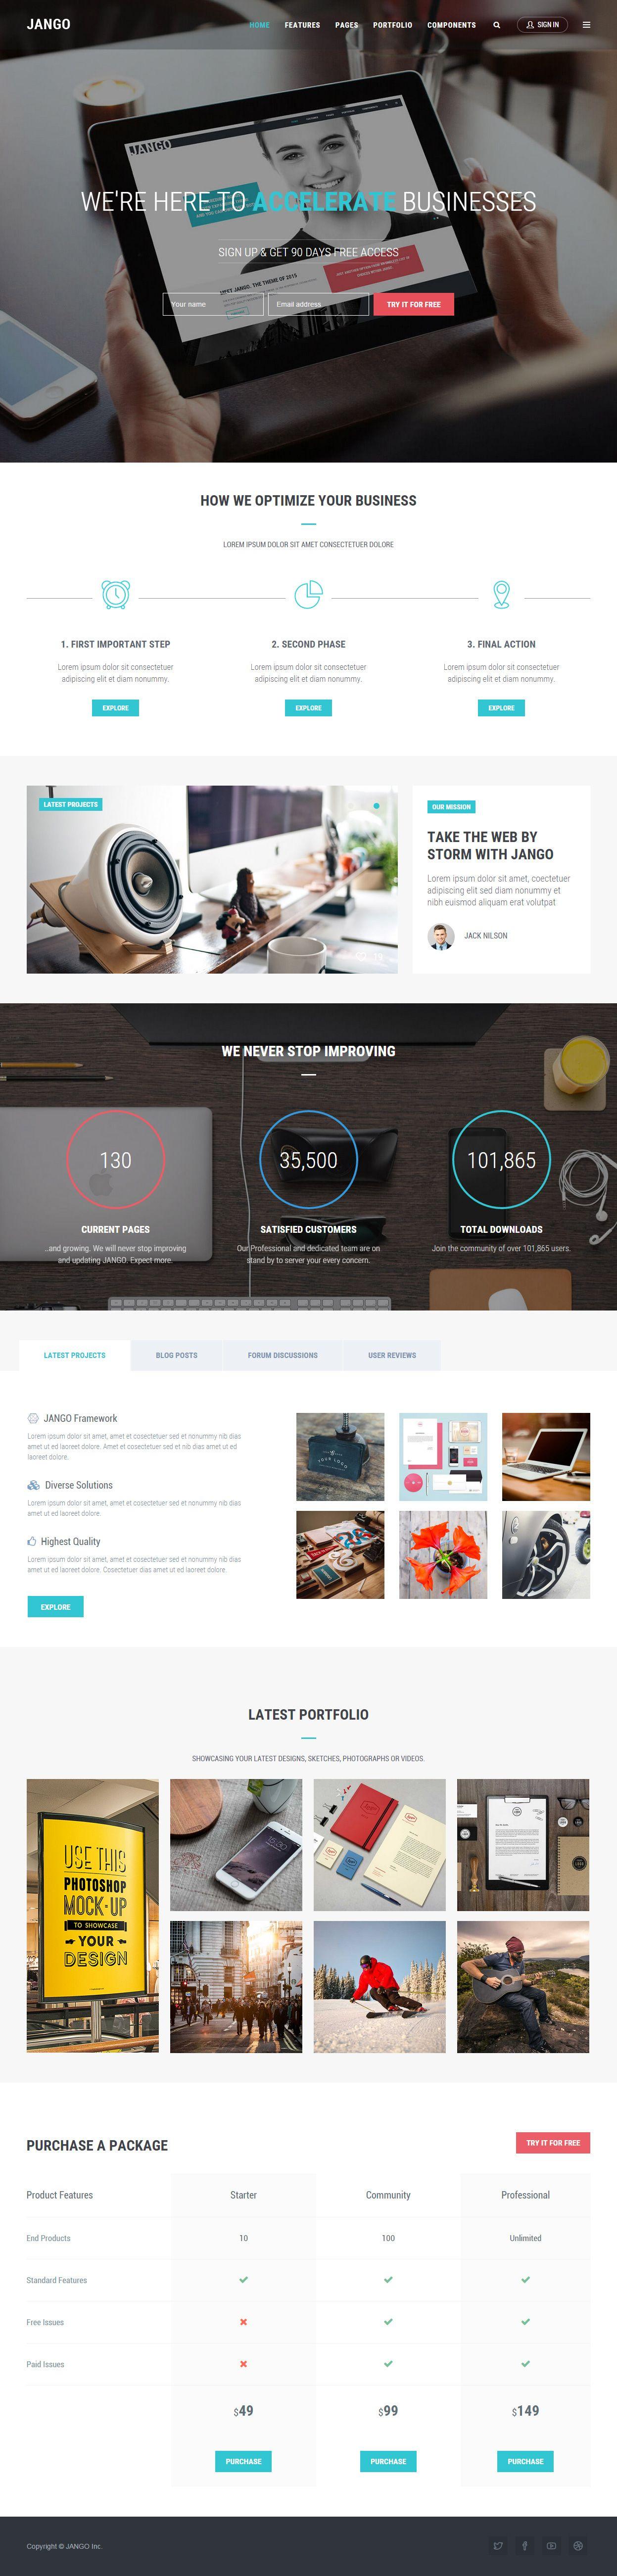 Jango Premium Responsive MultiPurpose HTML5 Template